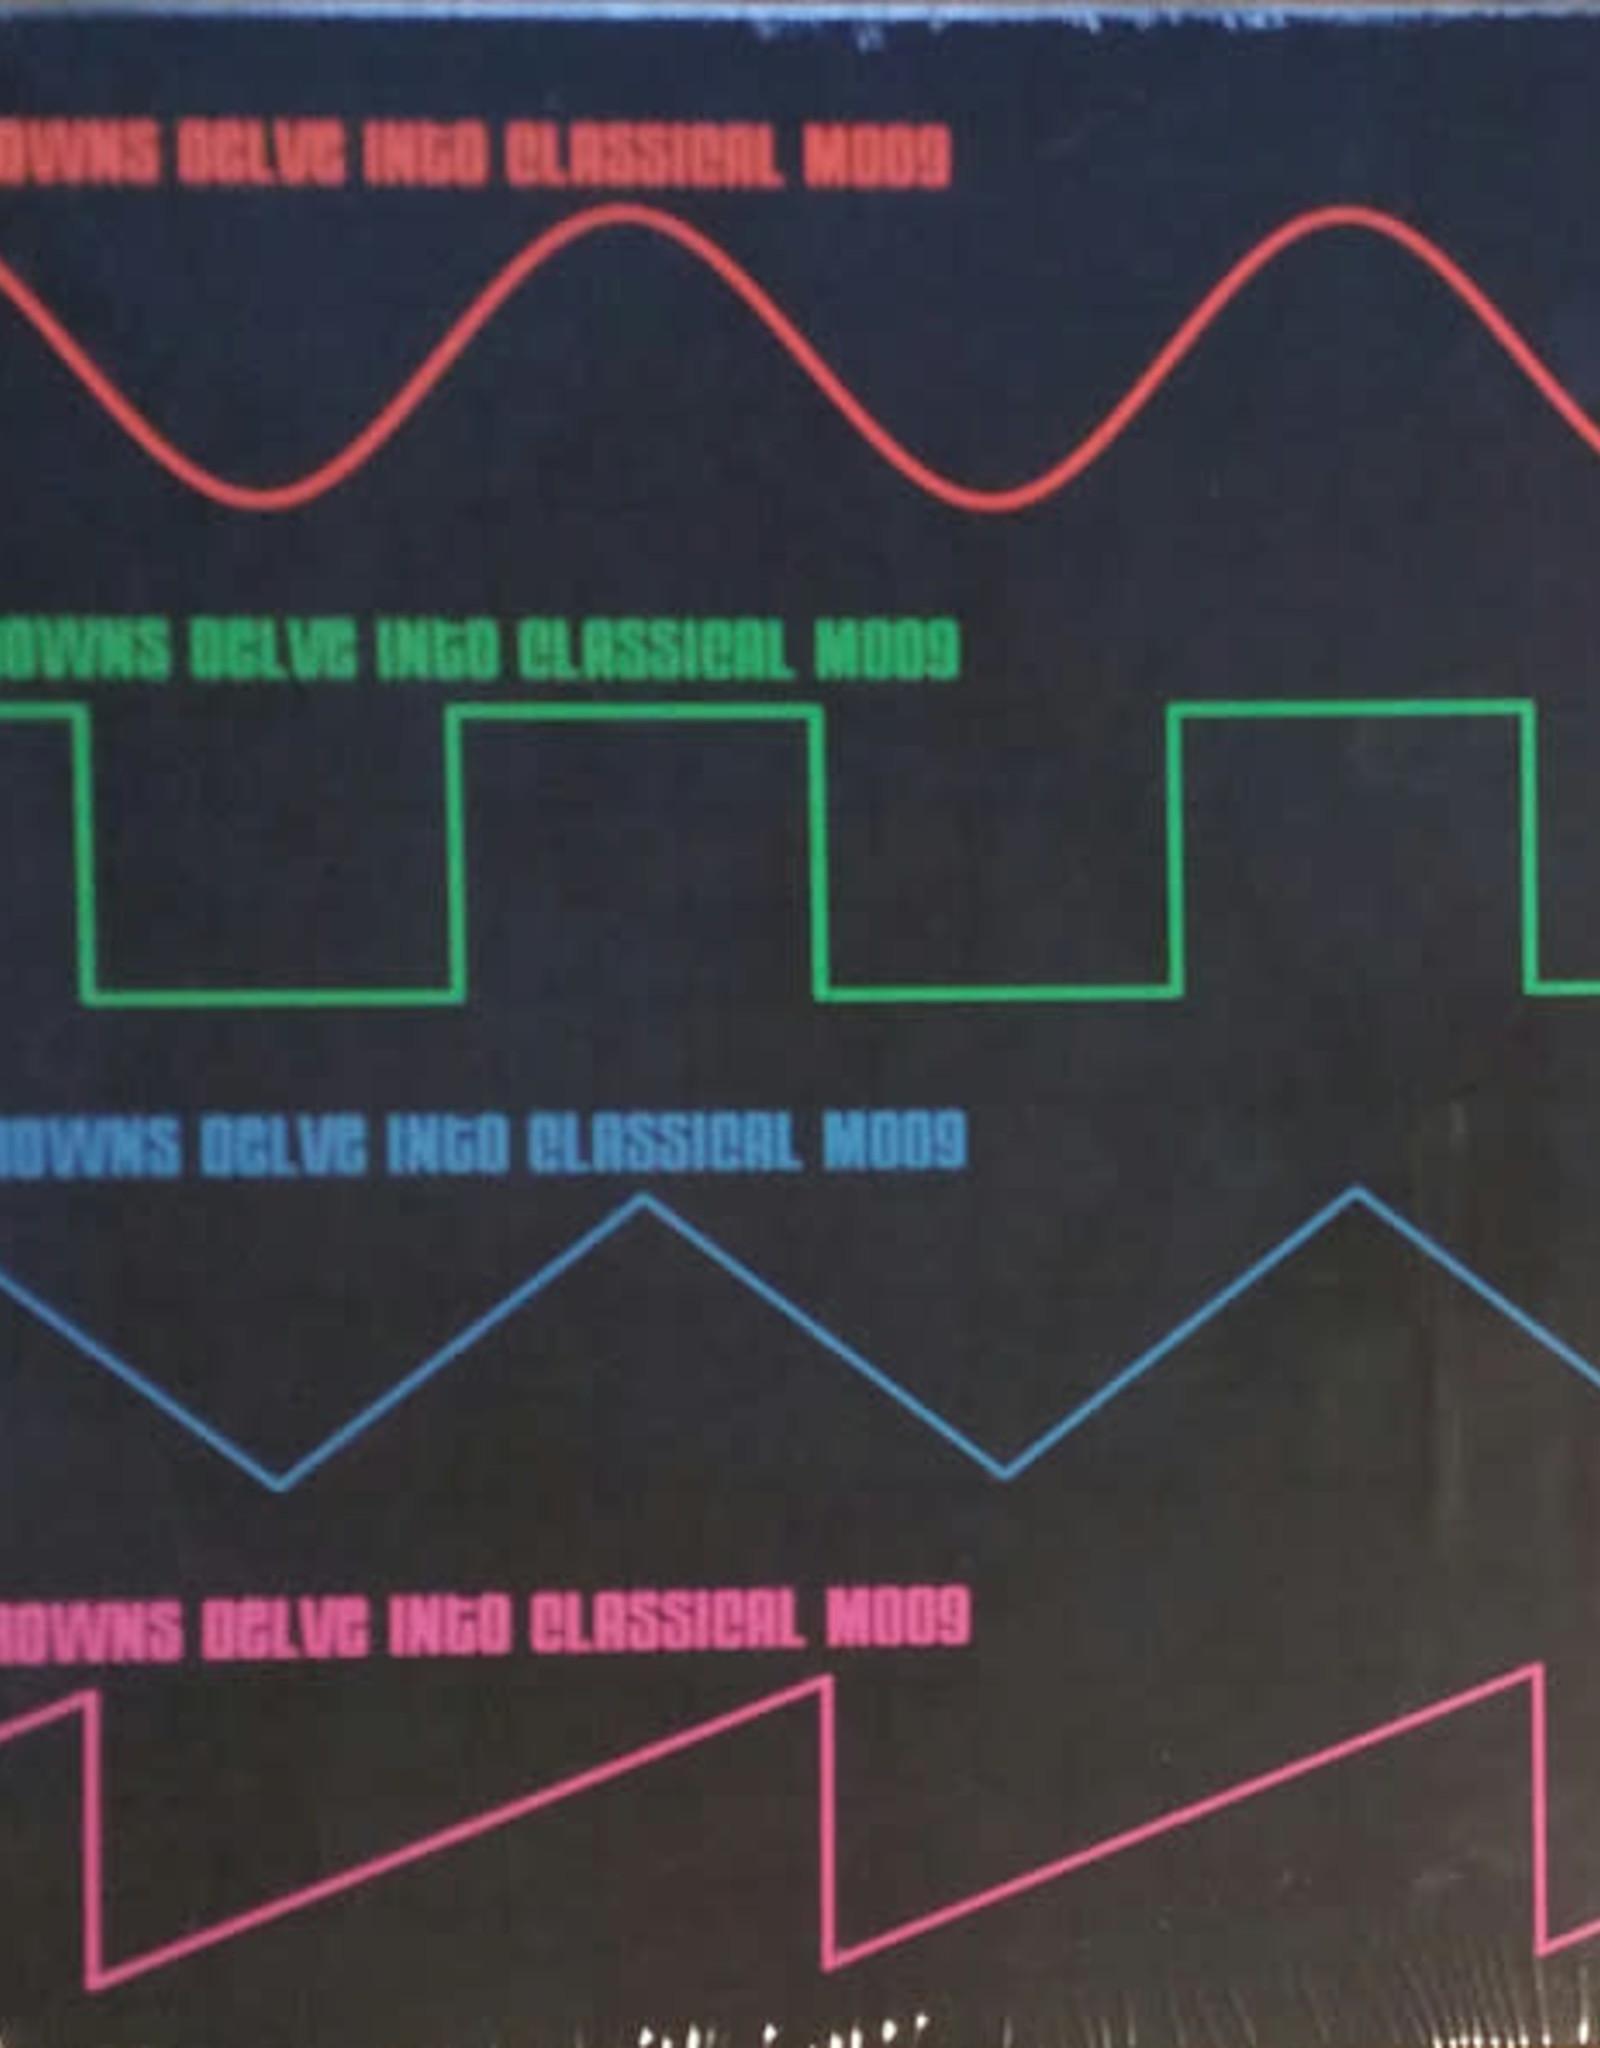 Kev Brown - Delve Into Classic Moog